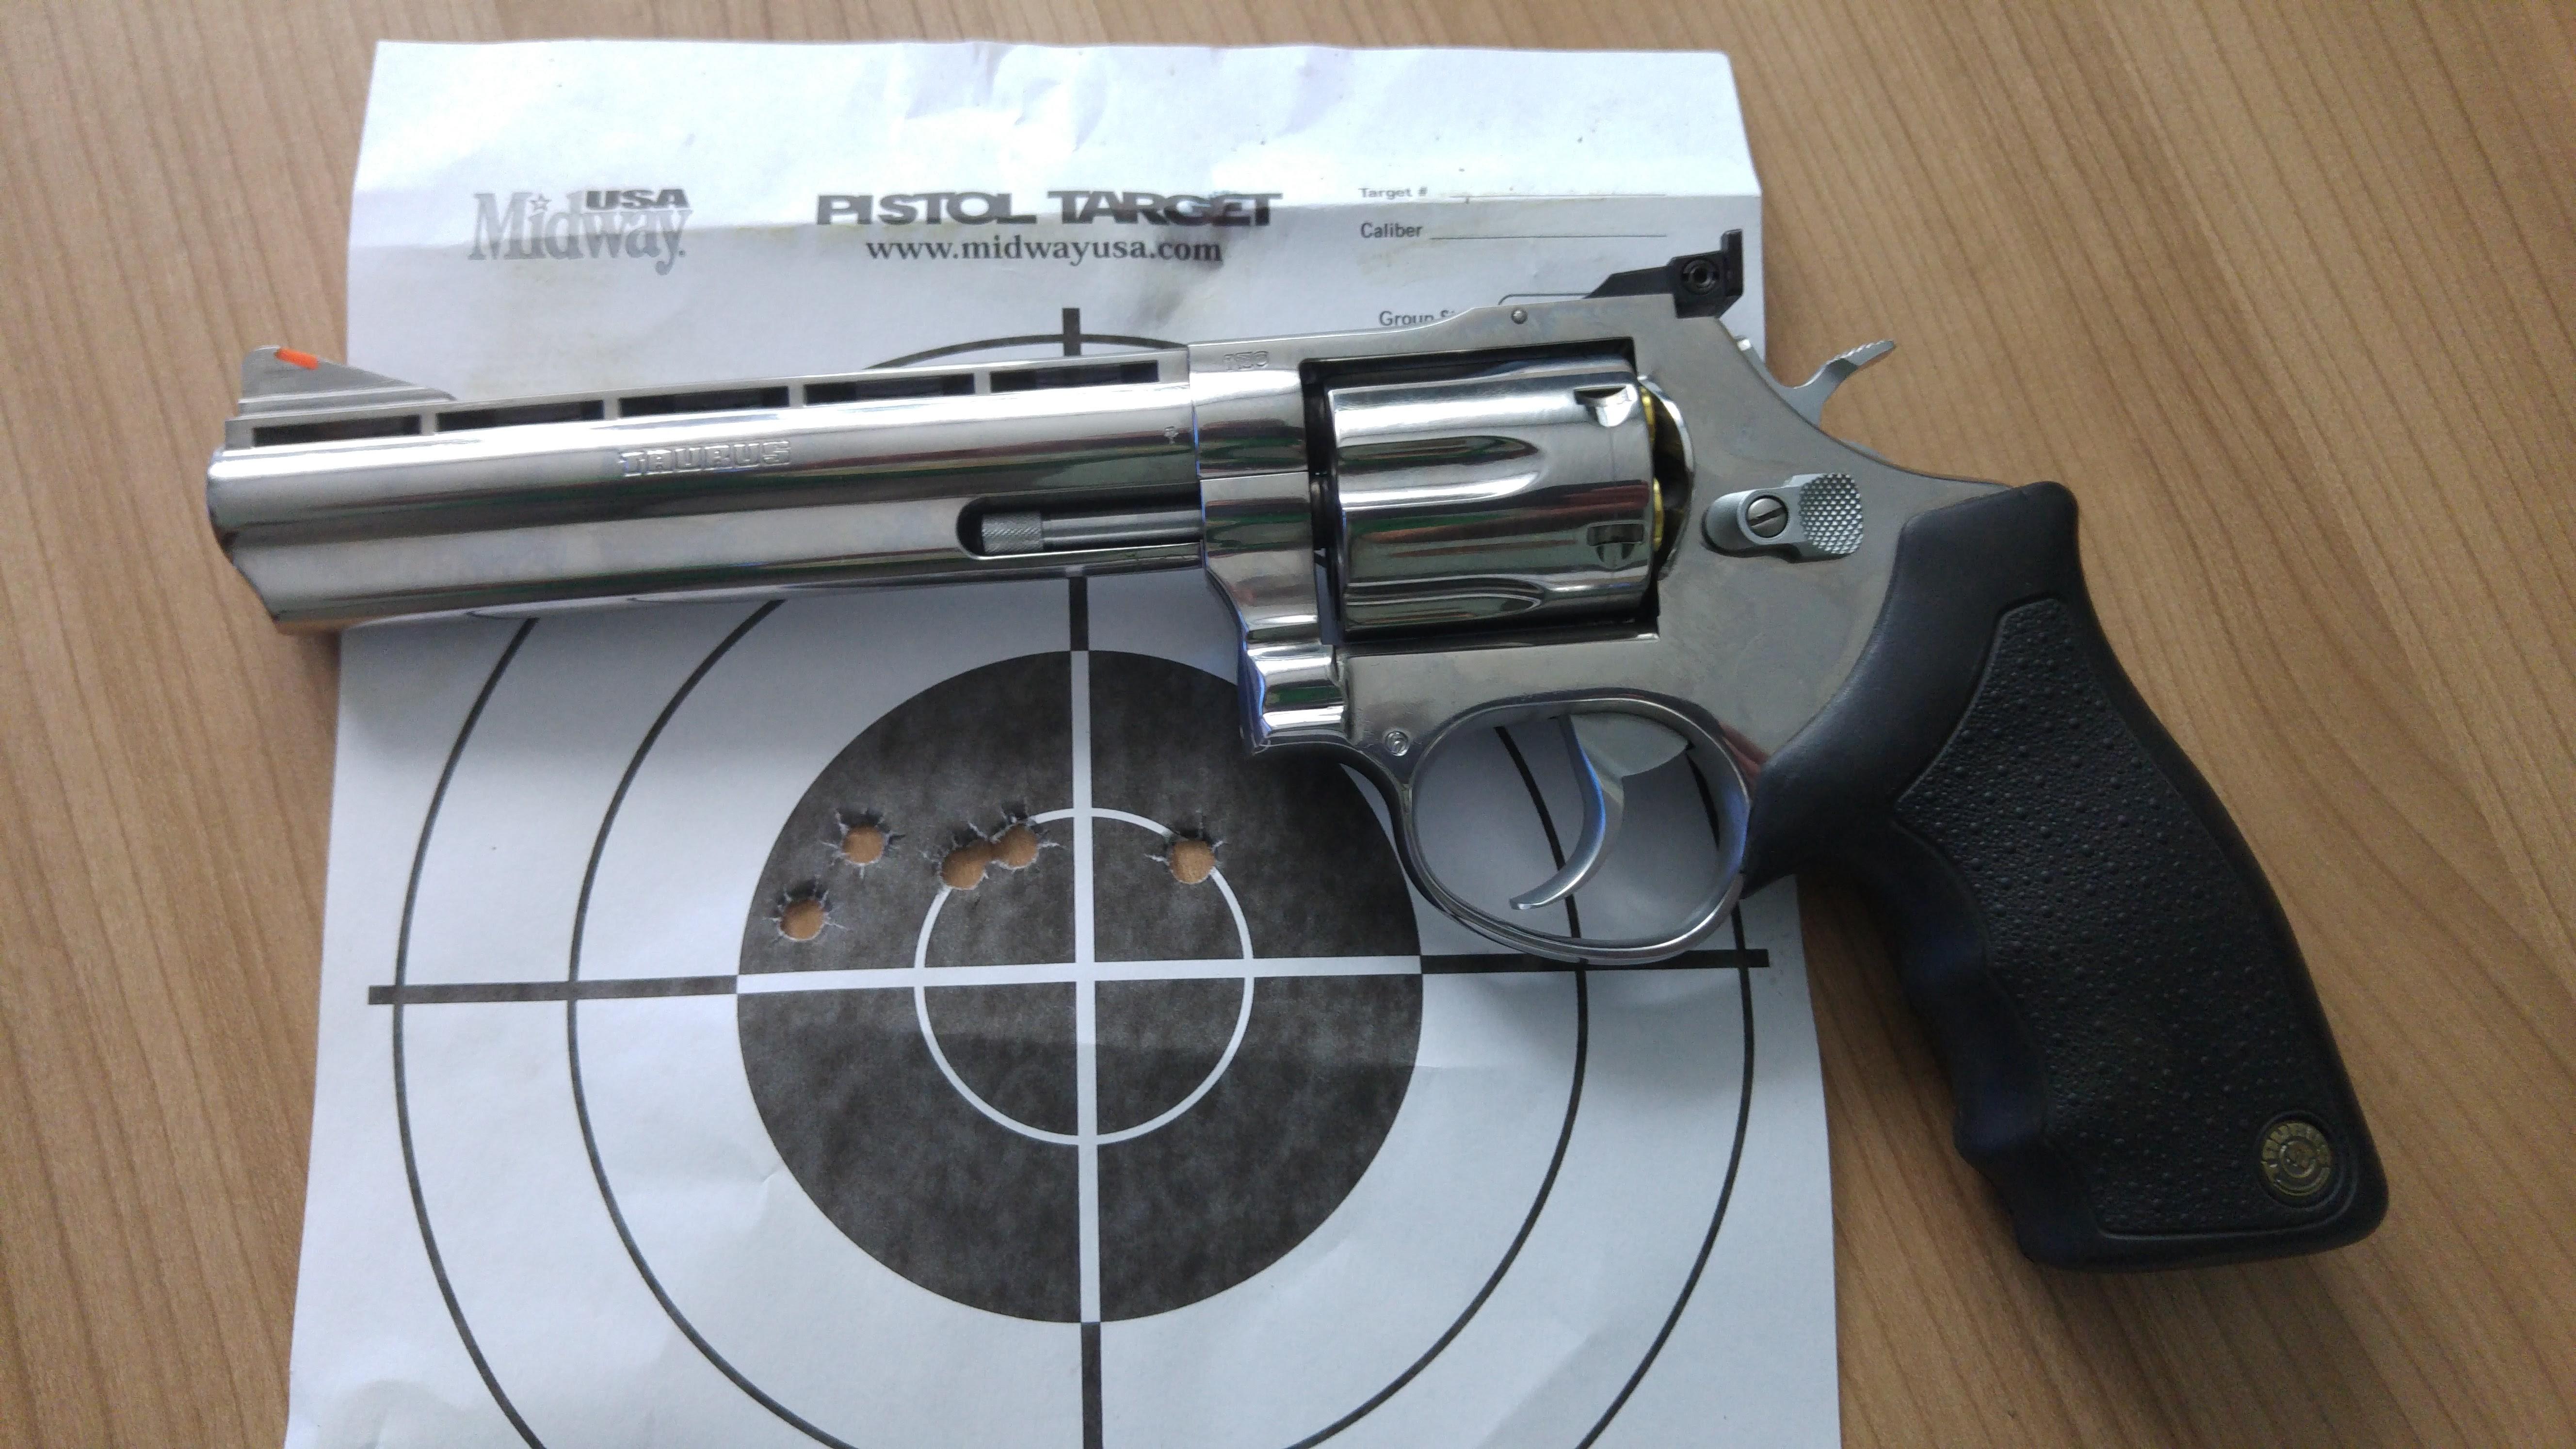 Taurus Model 689 - Wikipedia